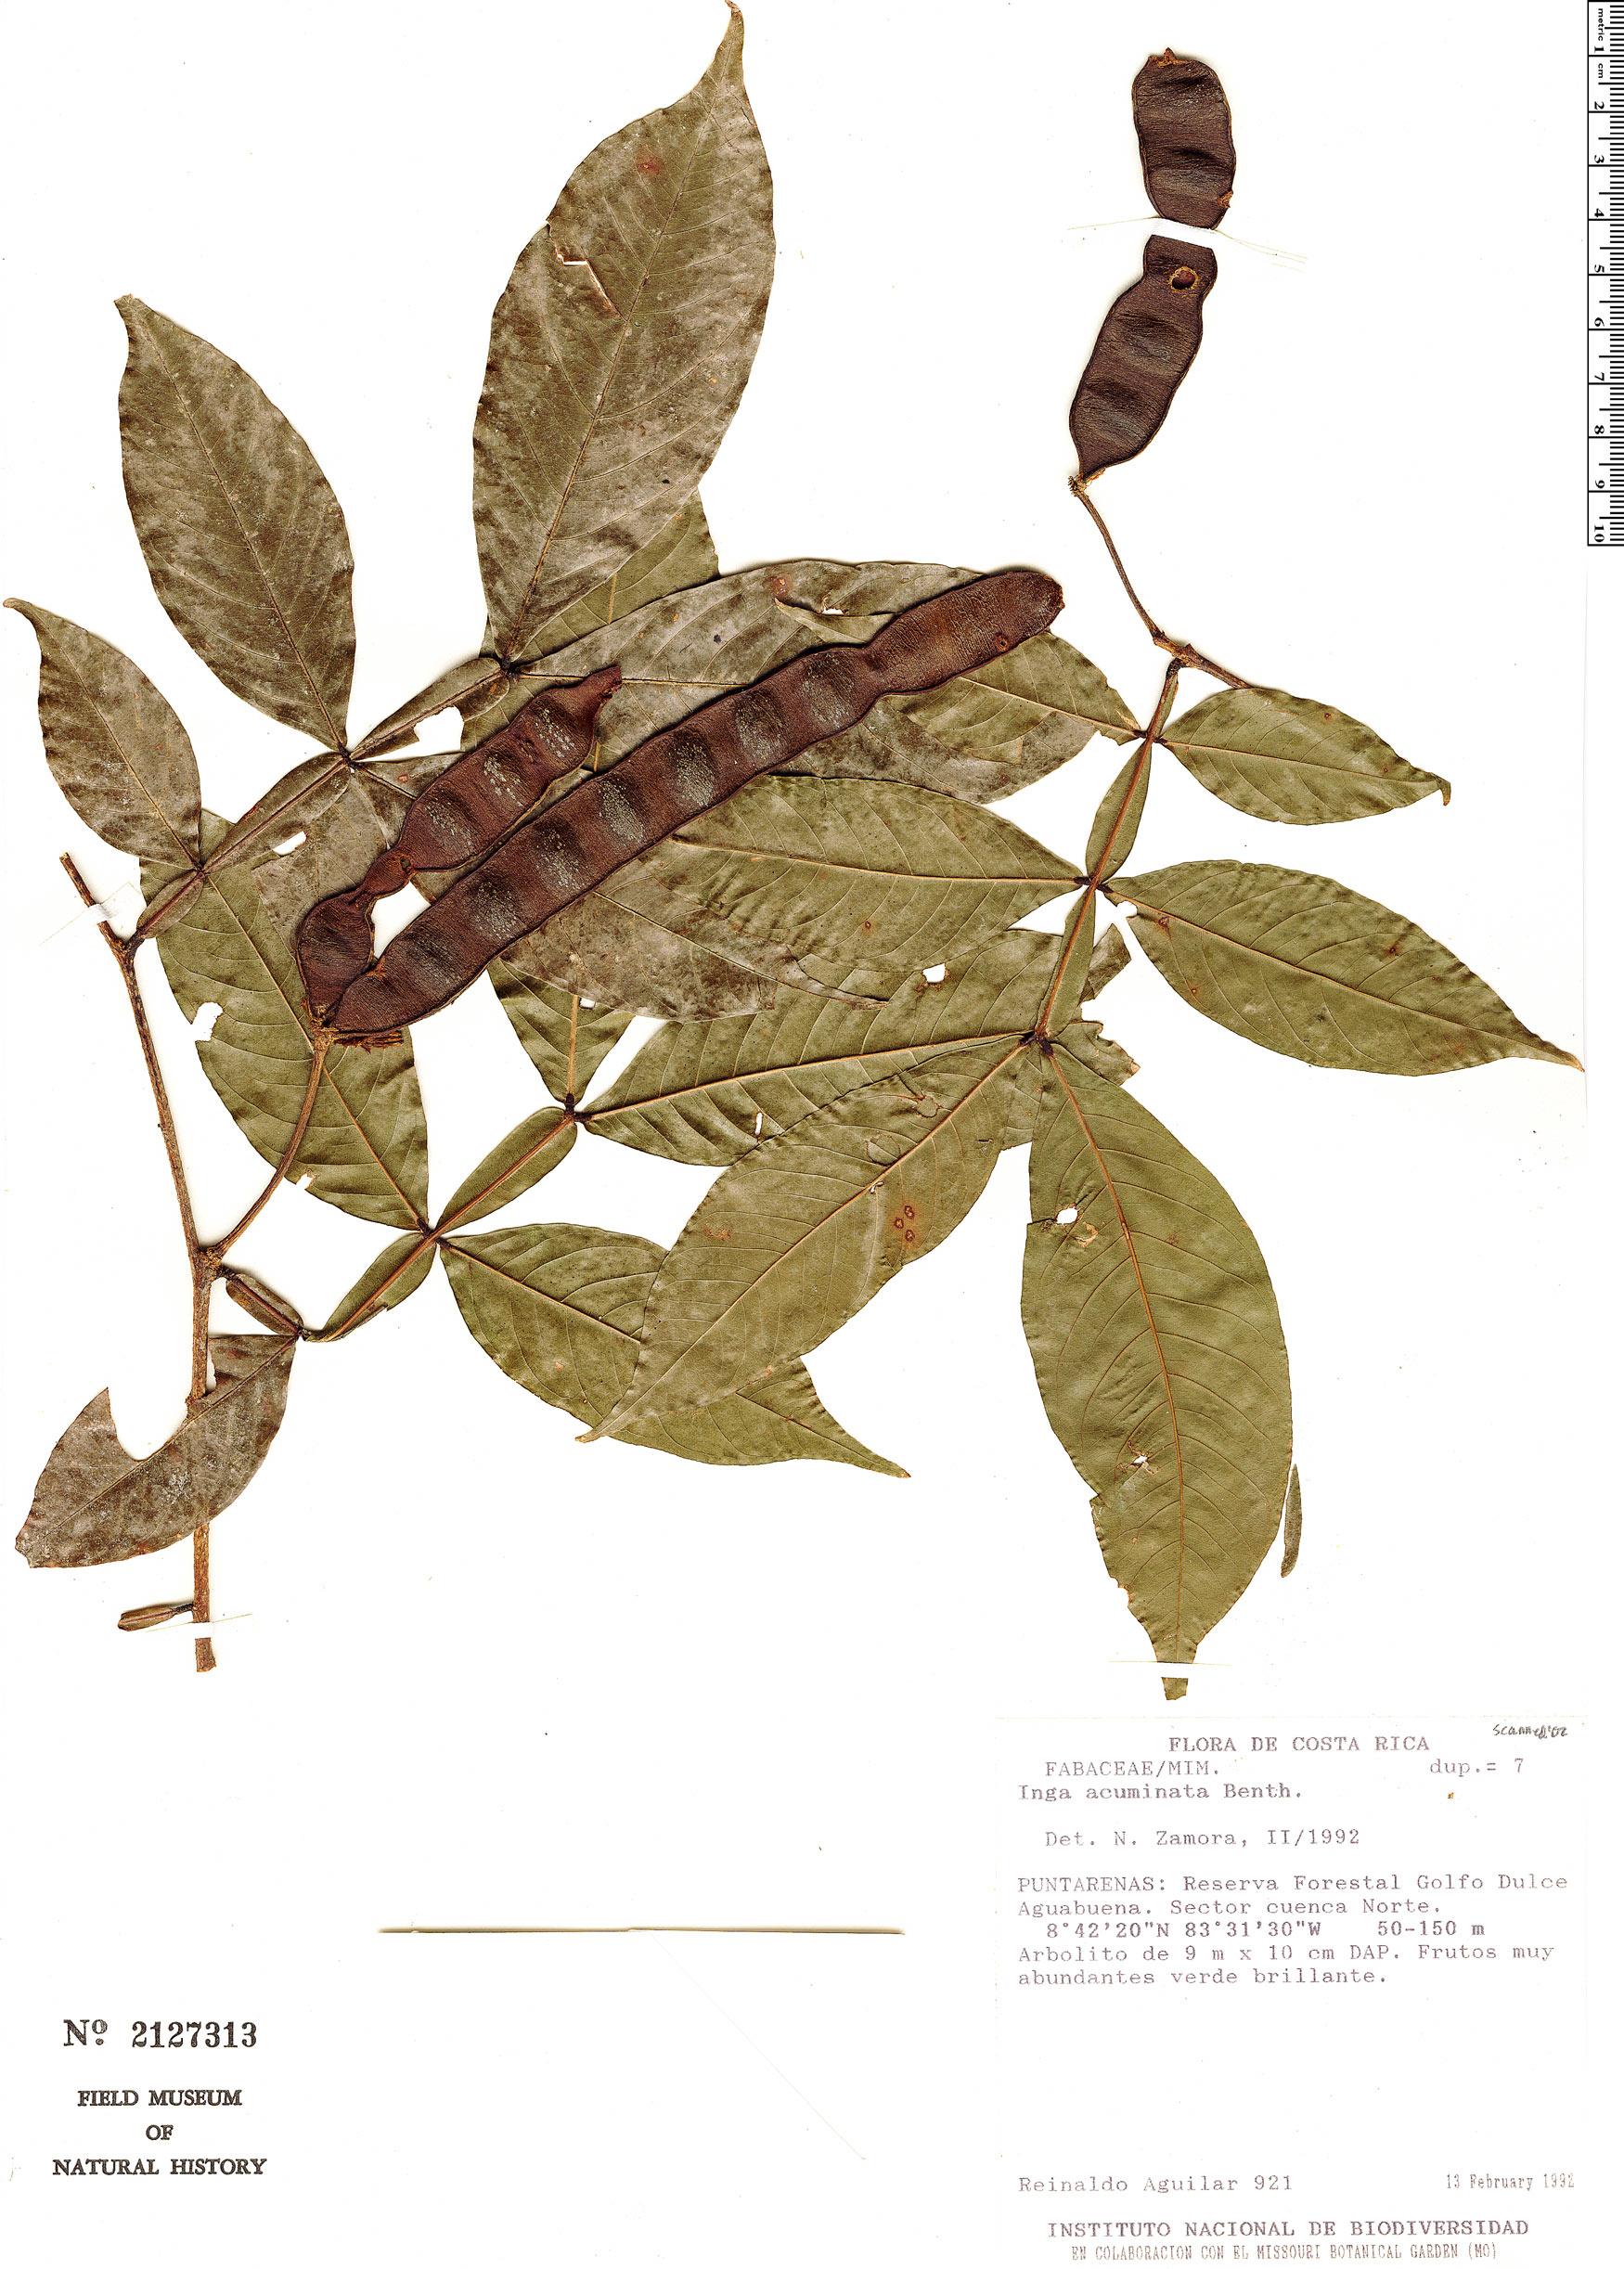 Espécime: Inga acuminata